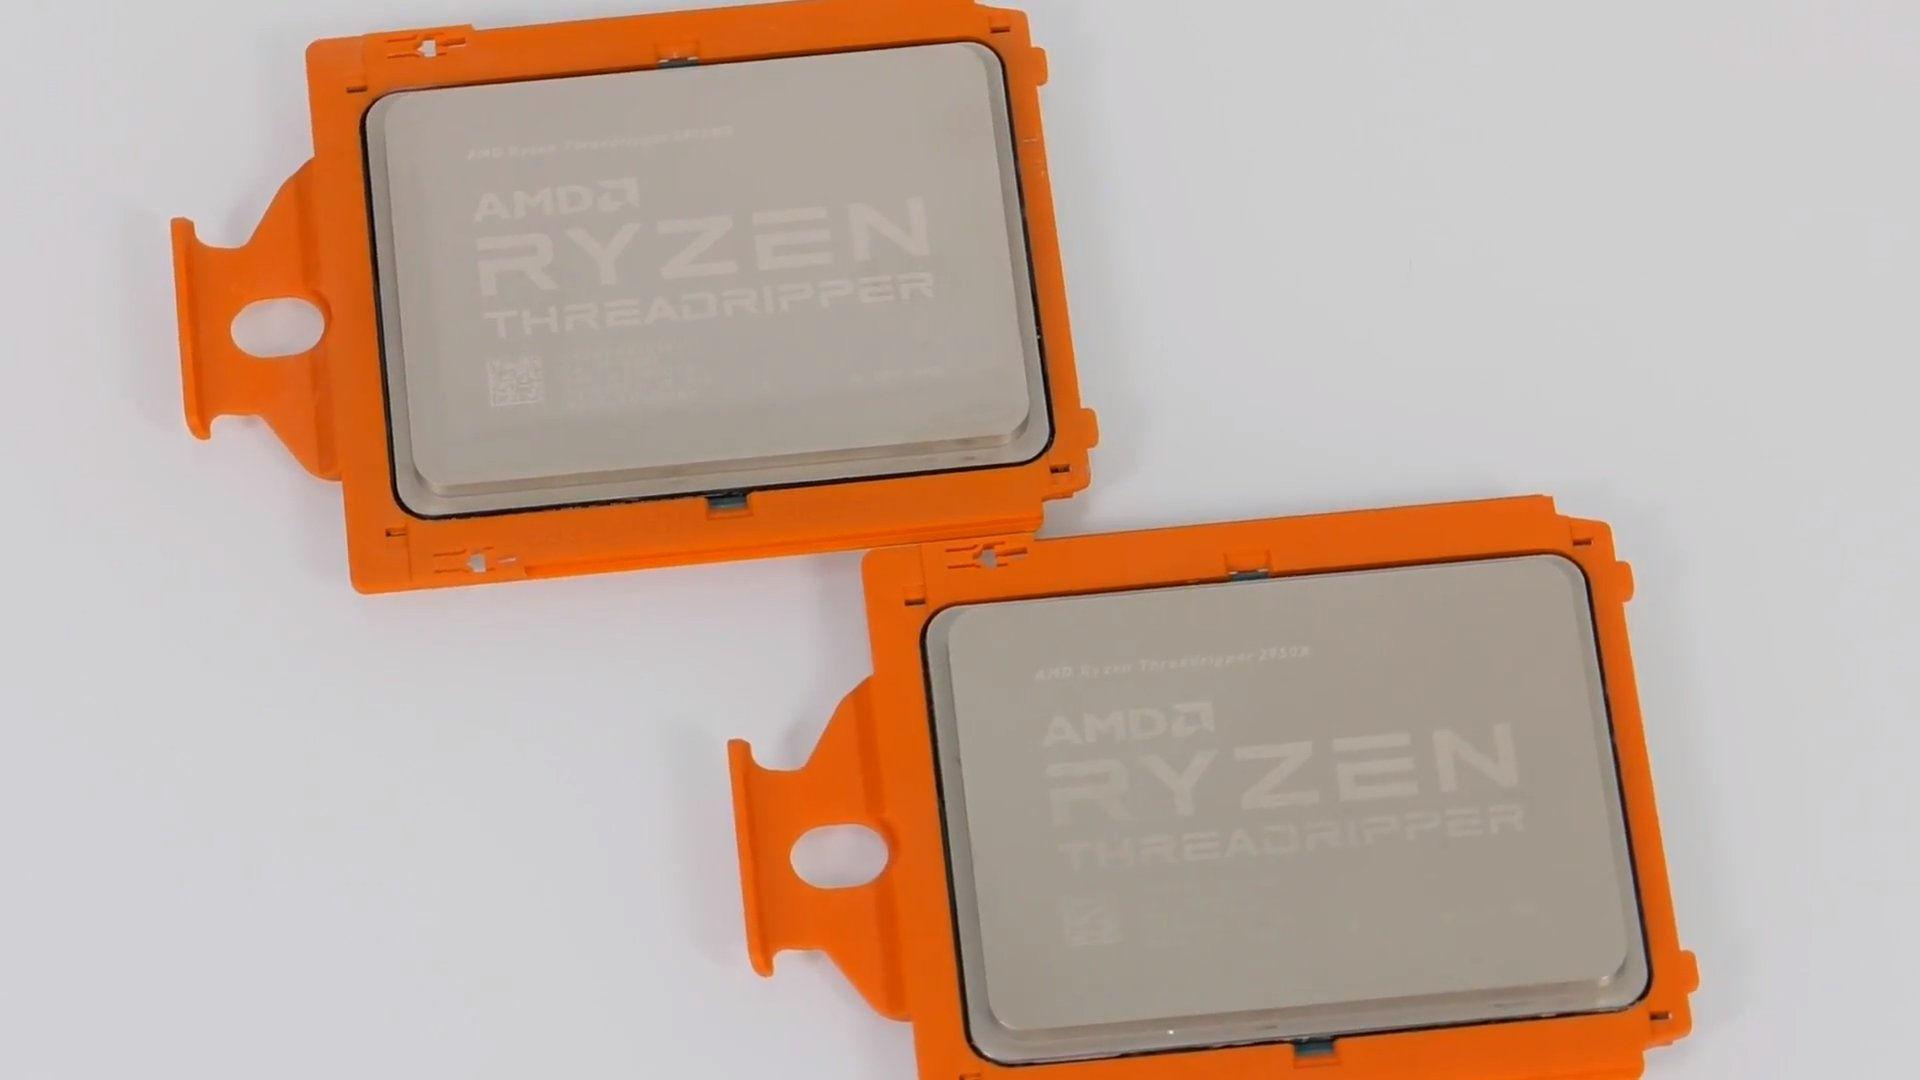 AMD Ryzen Threadripper 2990WX and Threadripper 2950X get